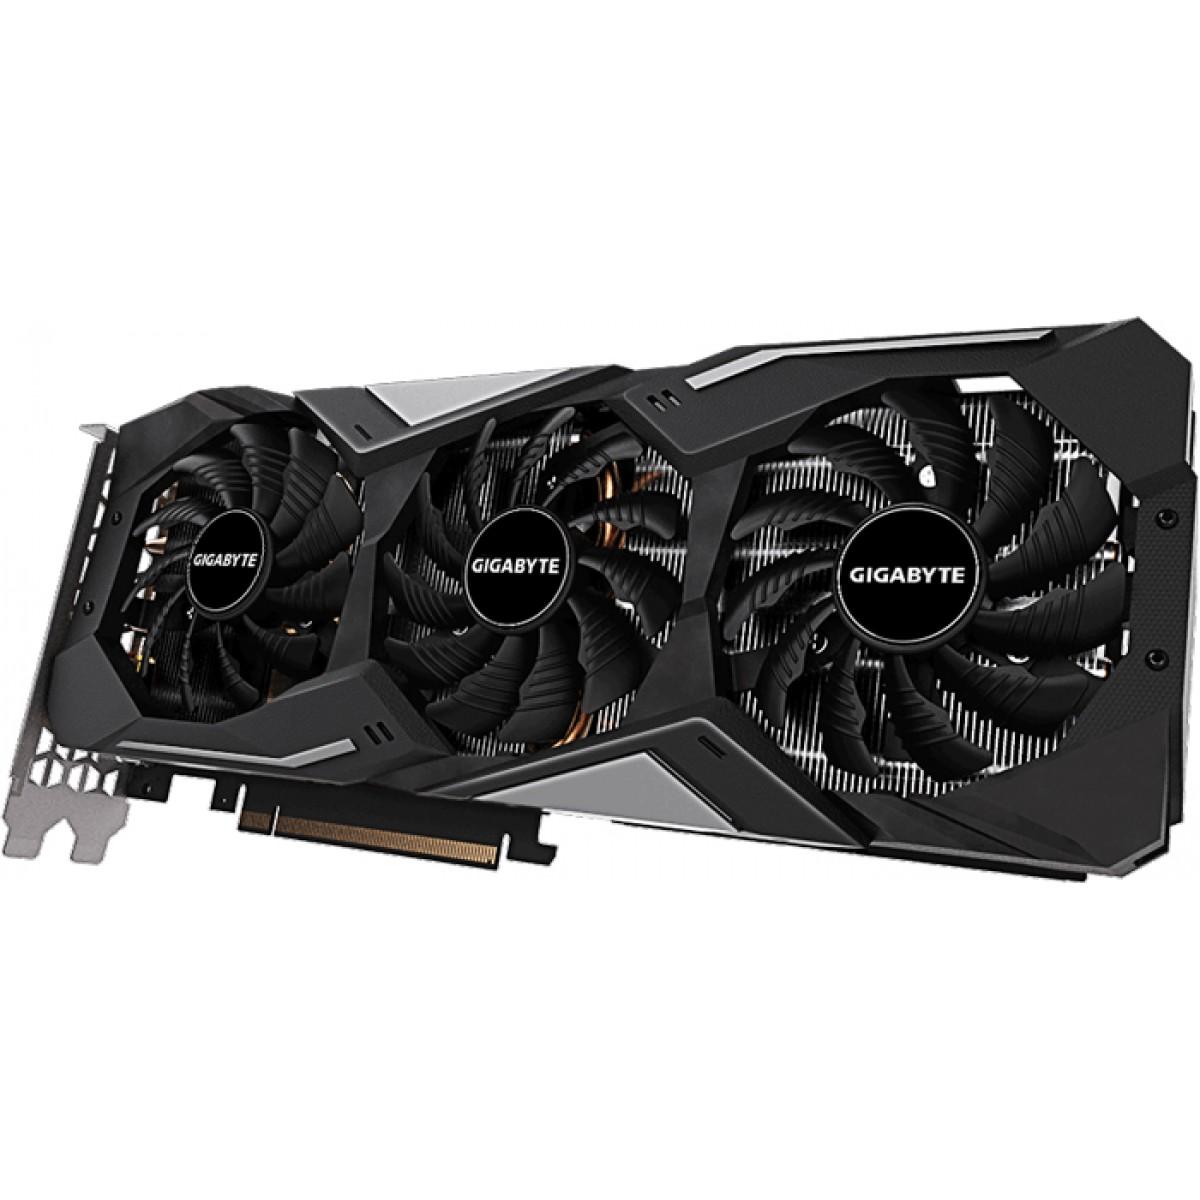 Placa de Vídeo Gigabyte GeForce RTX 2060 Super Gaming Oc, 8GB GDDR6, 256Bit